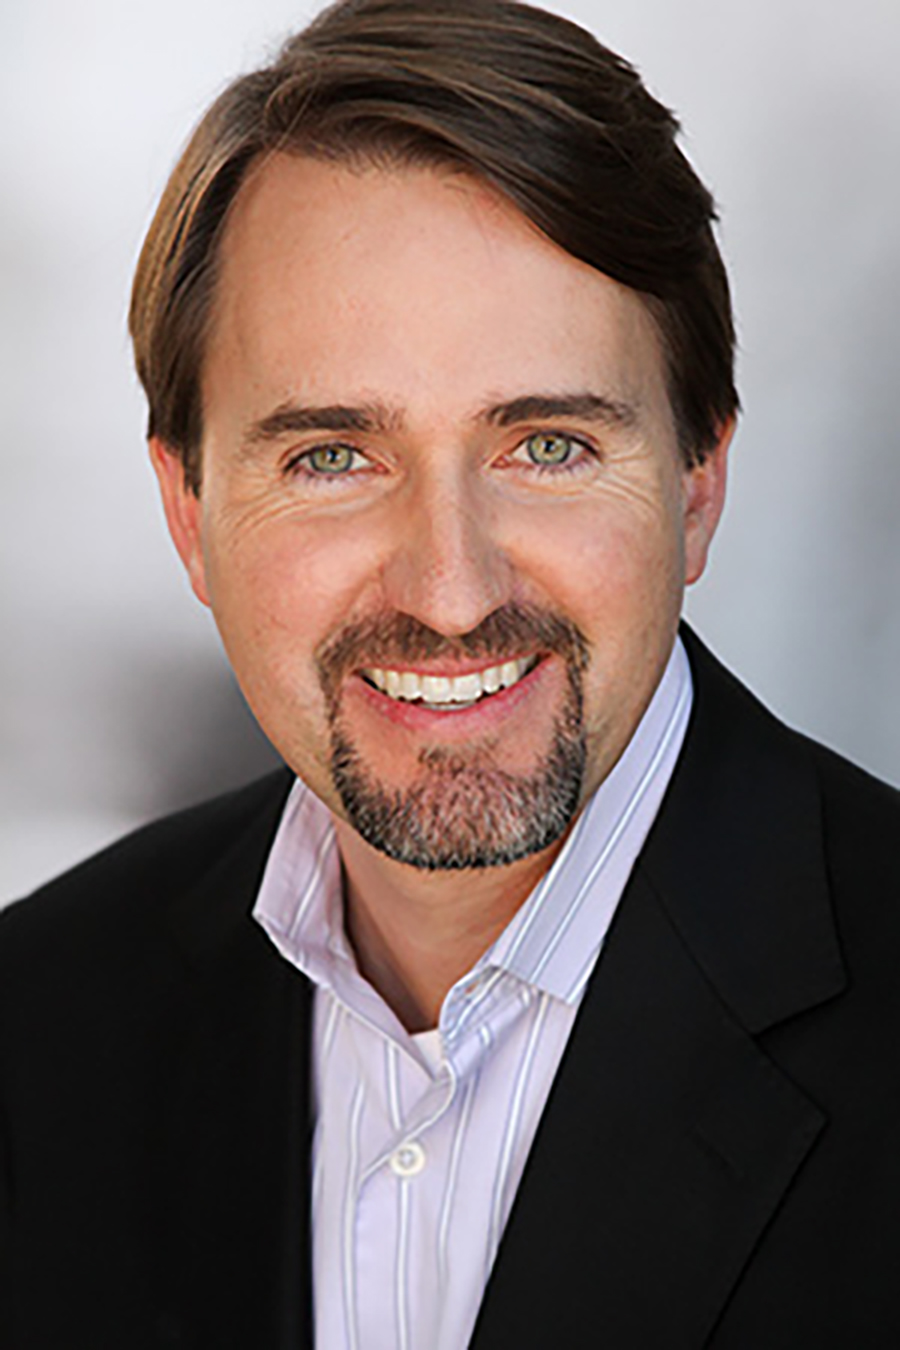 Carey J. Nease, MD